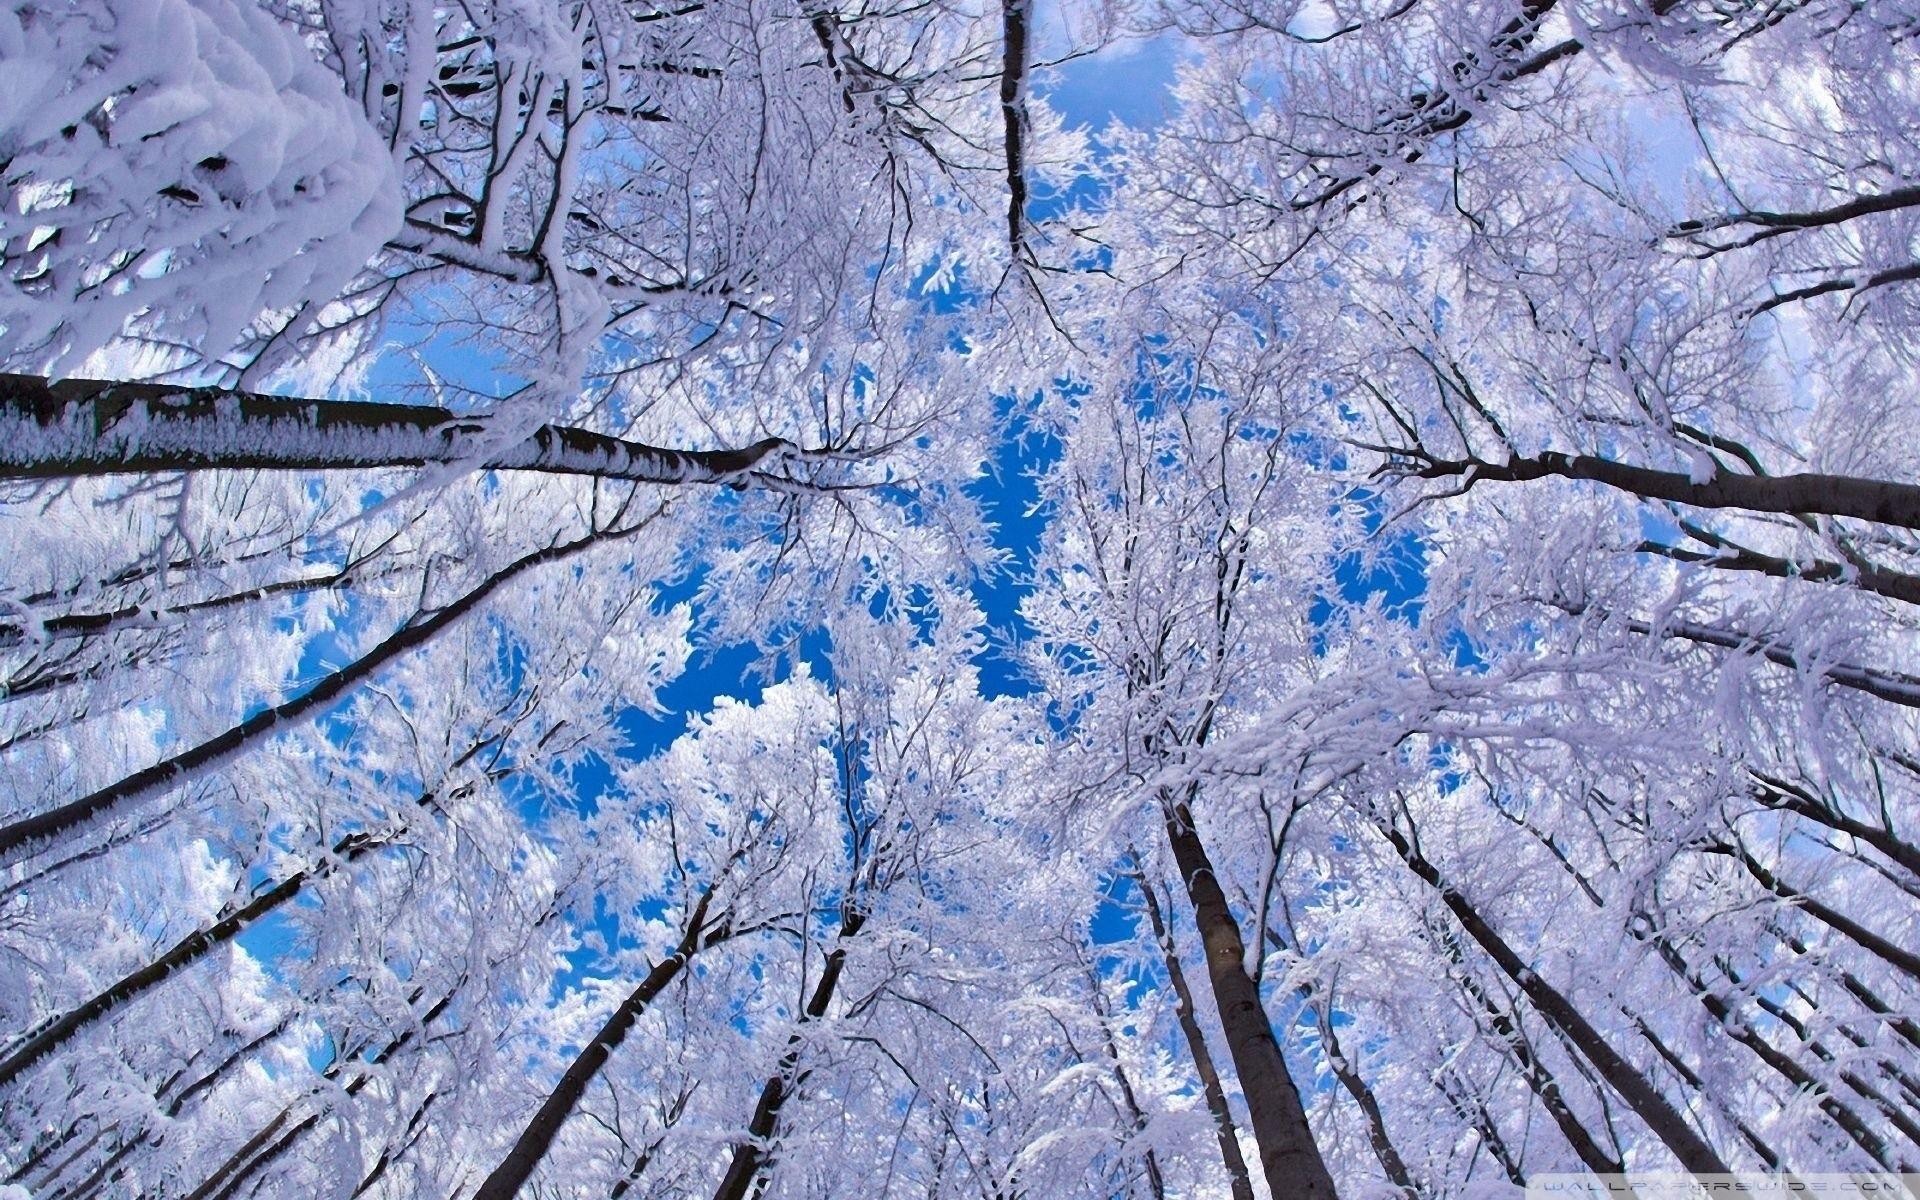 wallpaper-winter-iphone-photo-download-free-13